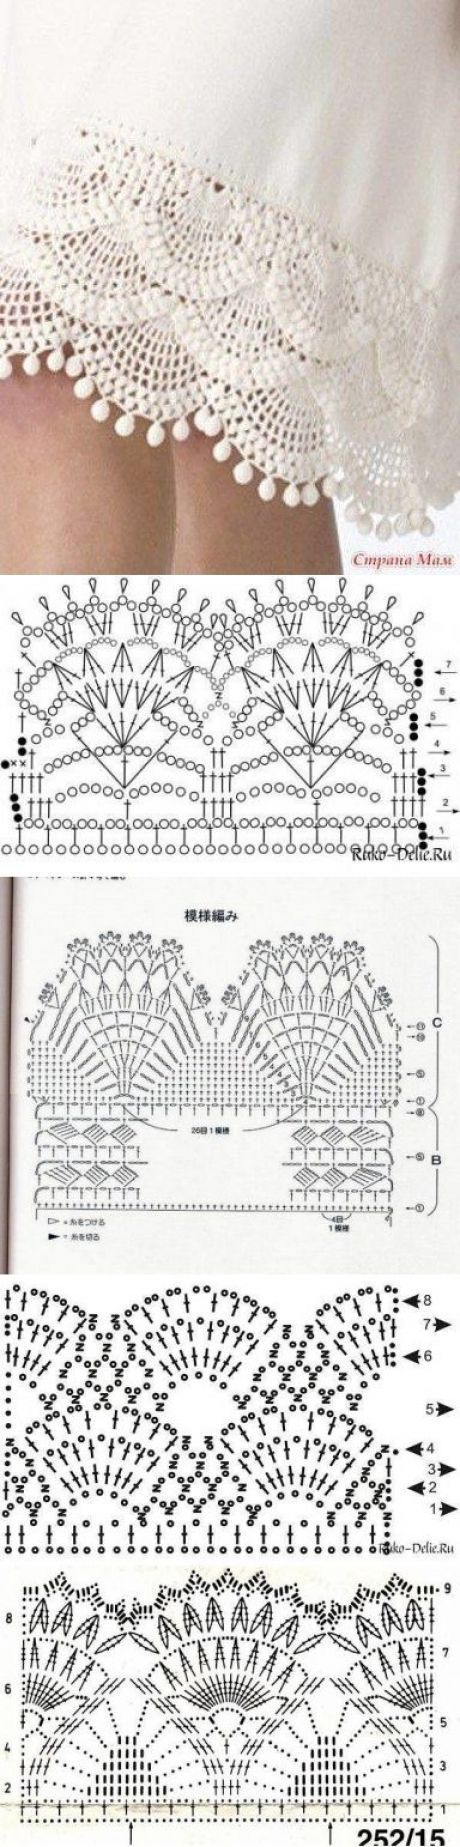 How to Crochet Wave Fan Edging Border Stitch #filetcrochet